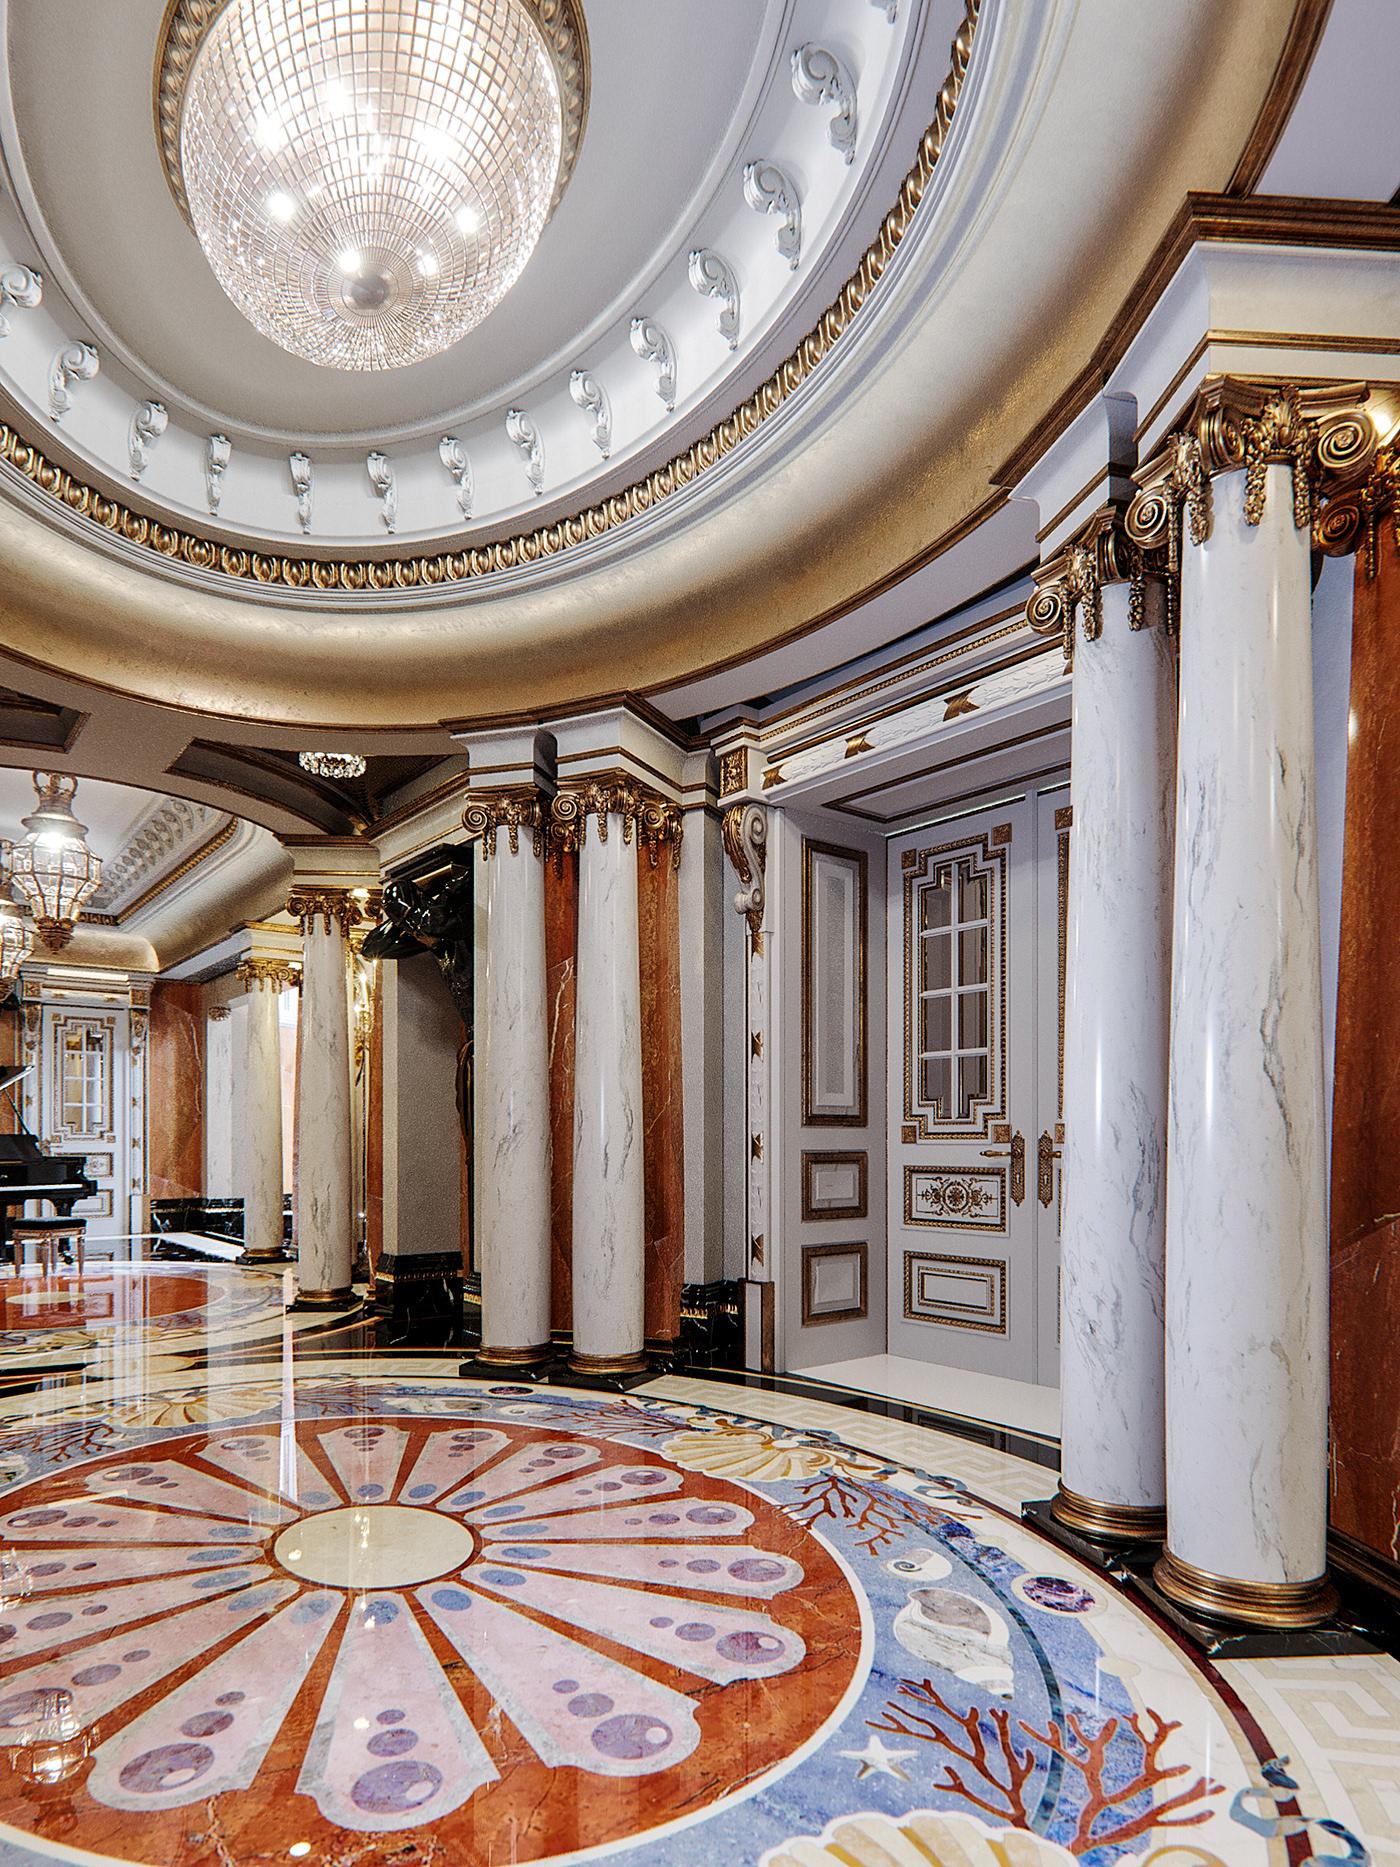 Hall Barocco sculpture clasics Interior Marble